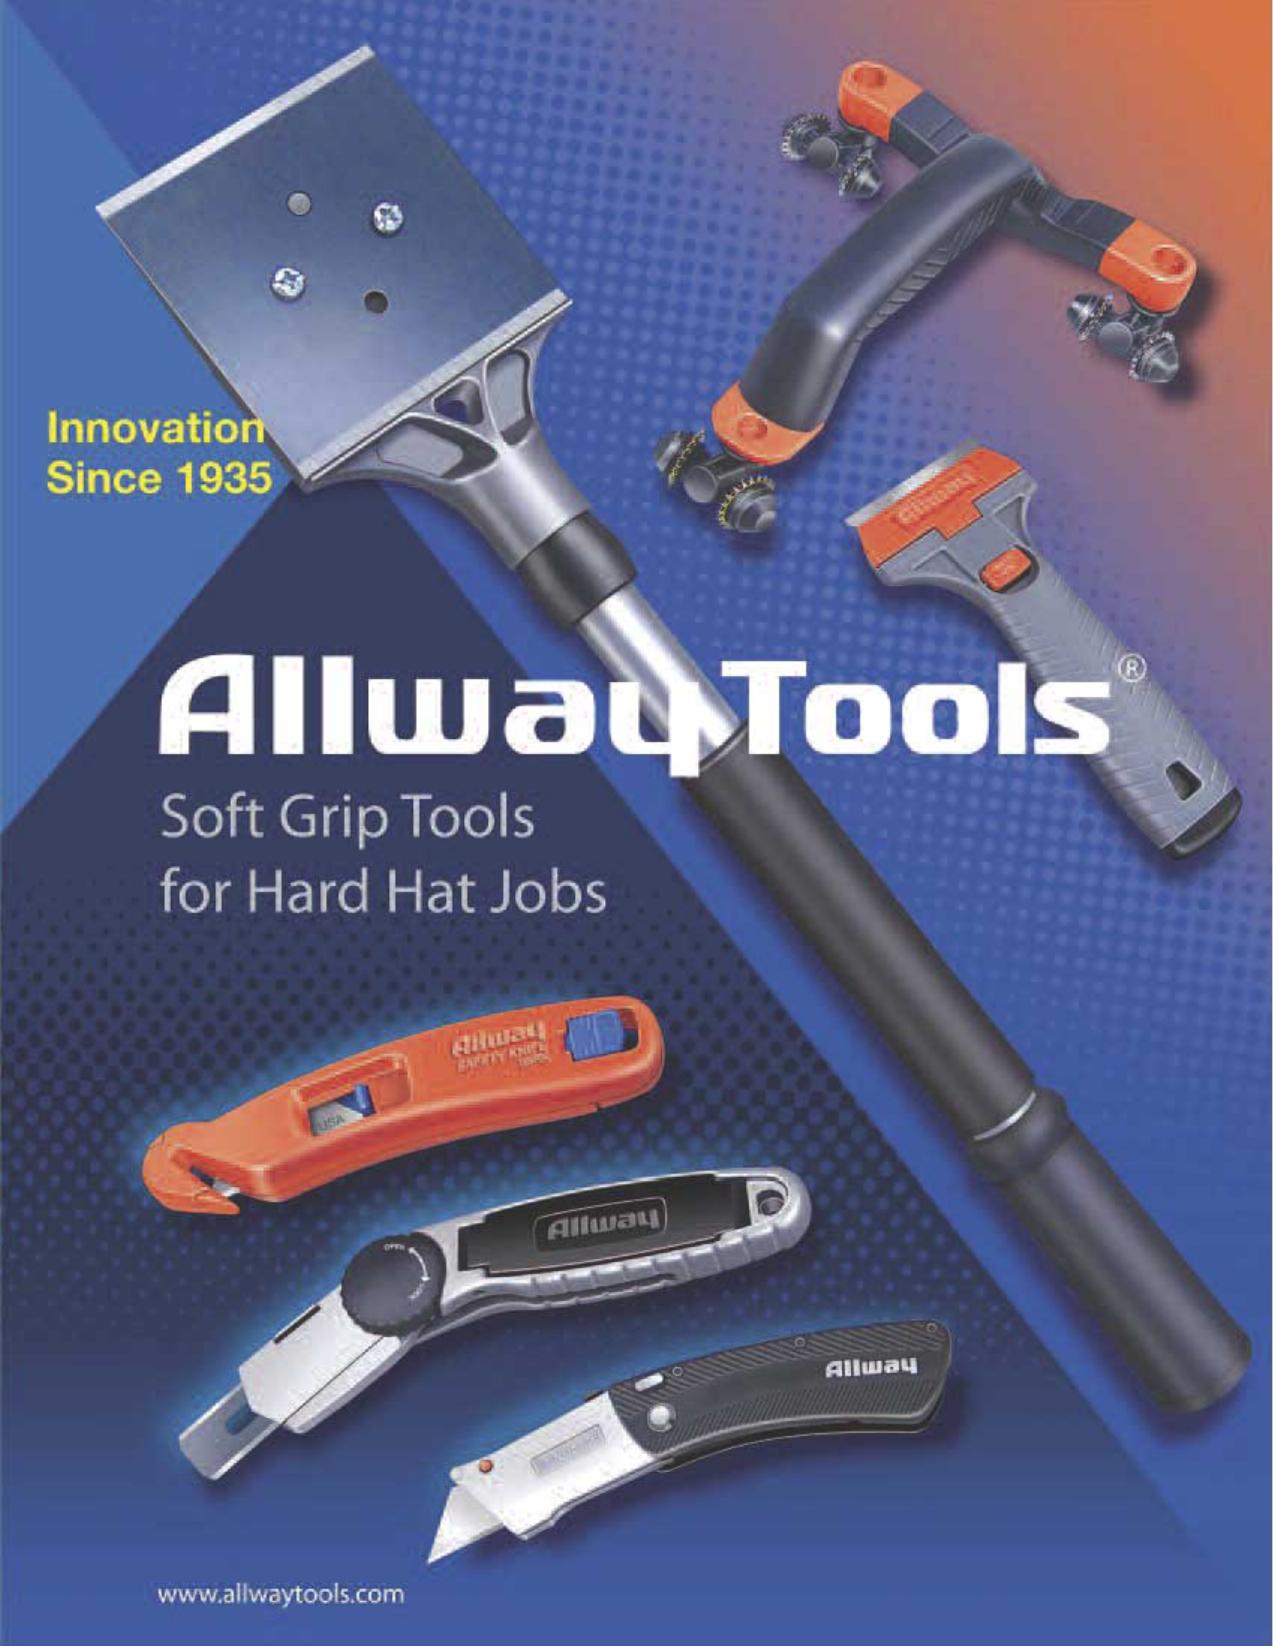 PHS Allway Tools Soft Grip Palm Sander